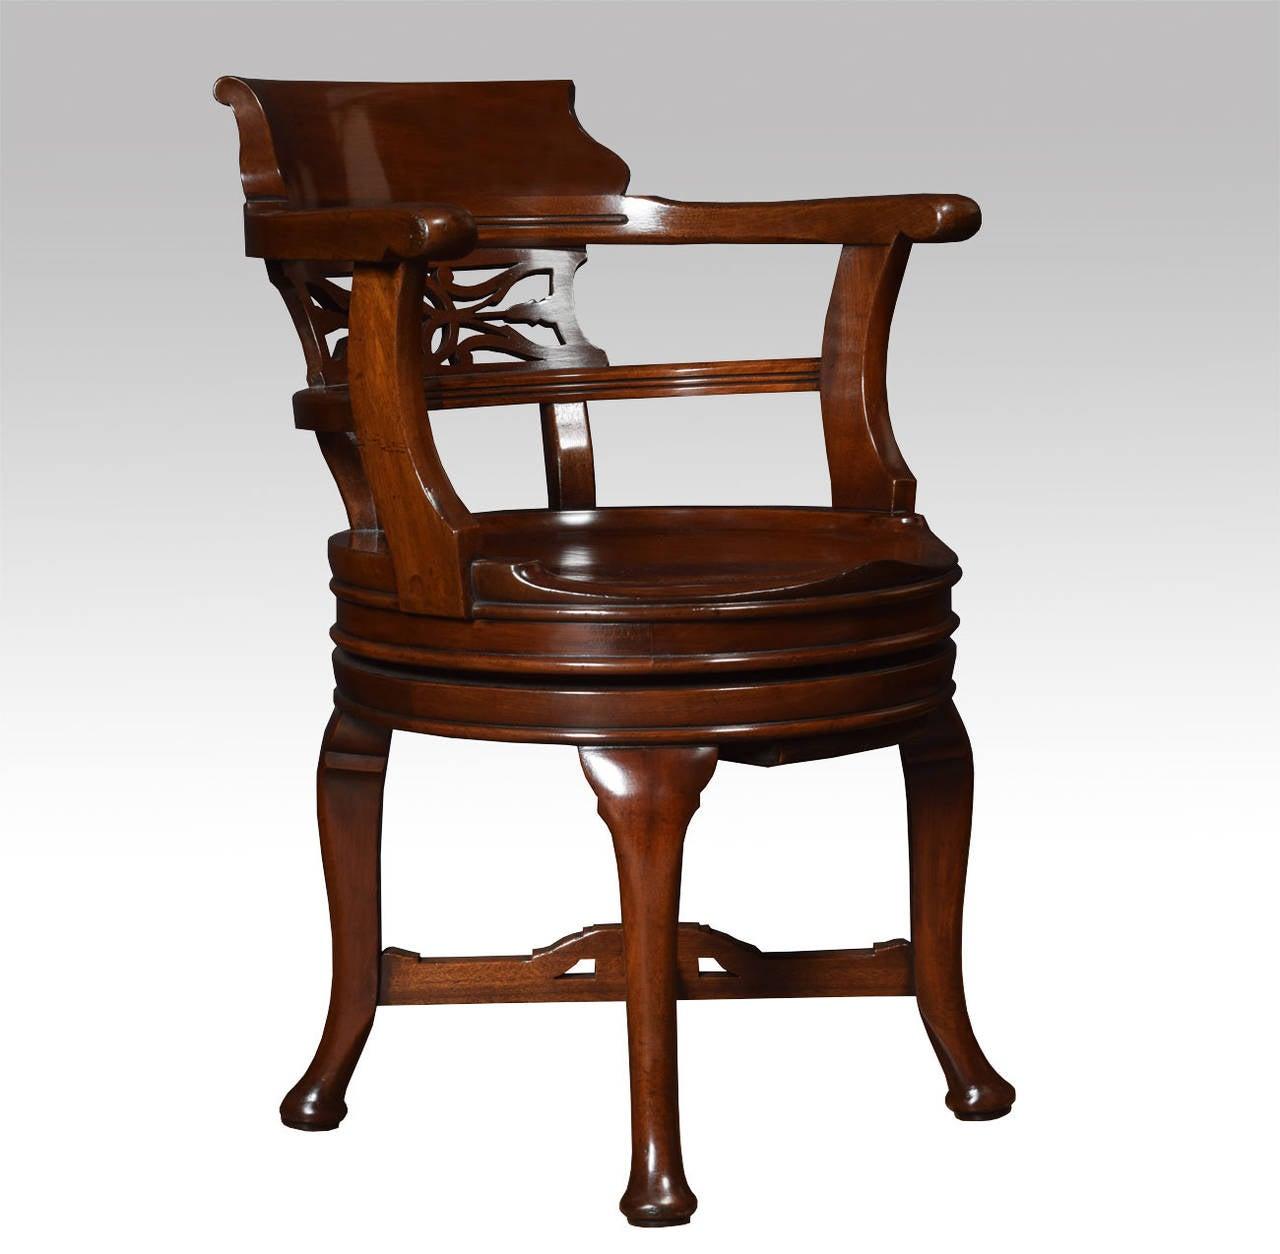 Mahogany Swivel Desk Chair at 1stdibs